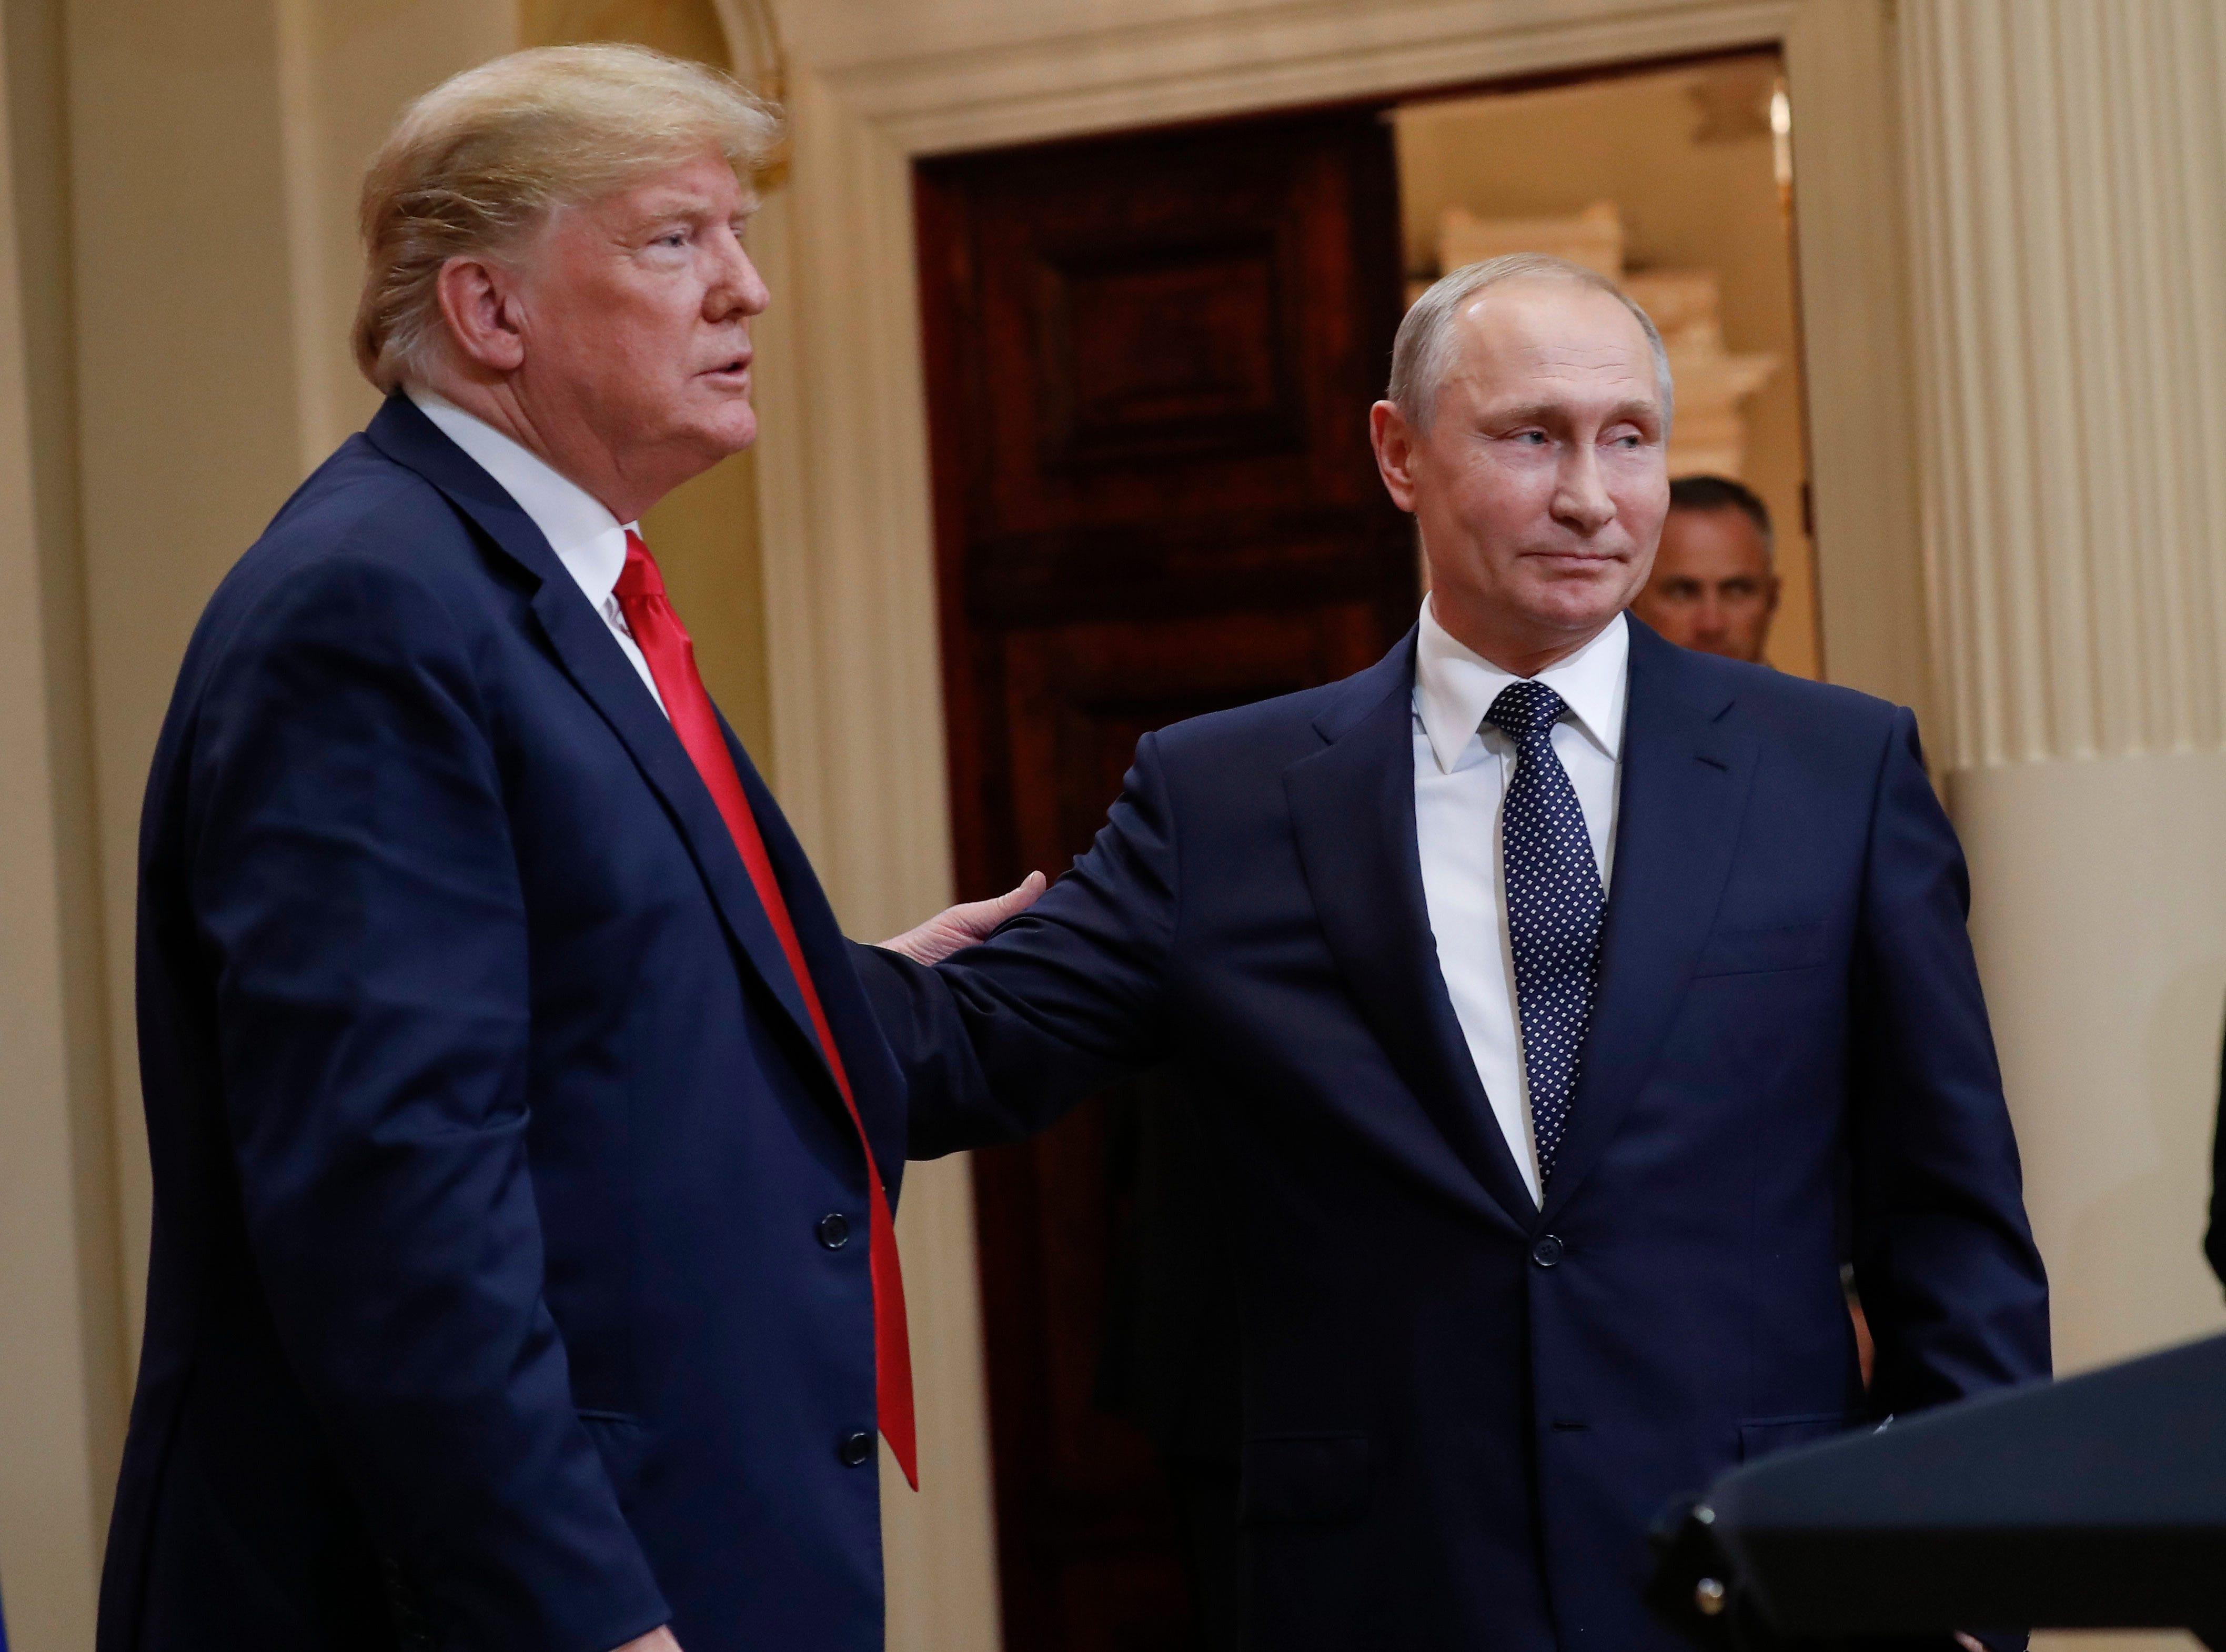 Trump's remarks disputing Russian meddling reverberates along Senate campaign trails nationwide